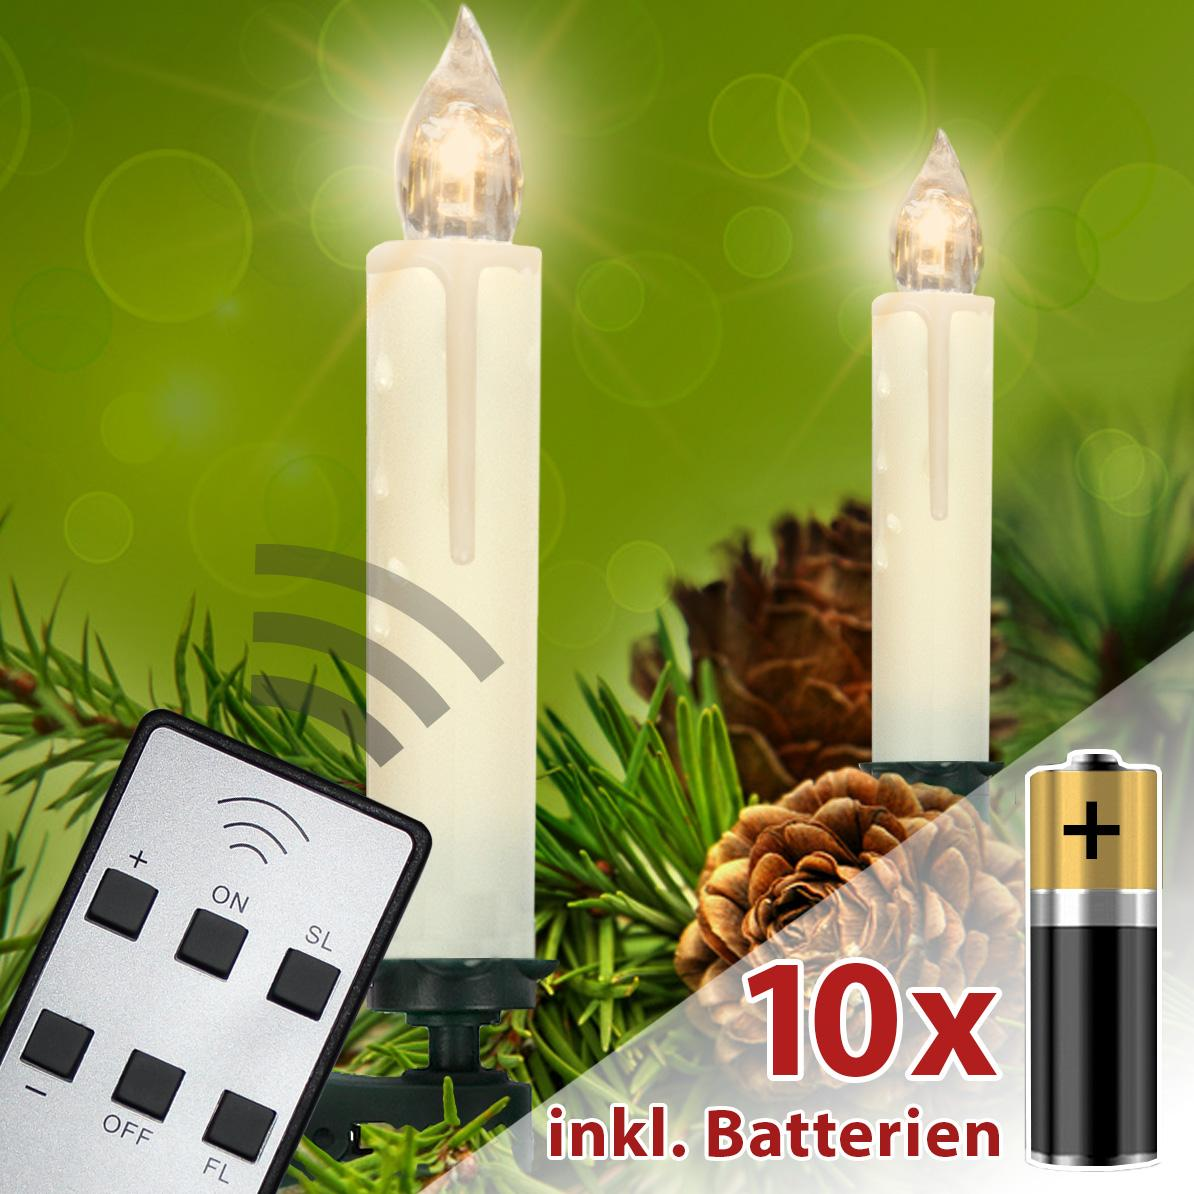 LED-Weihnachtskerzen-kabellose-Lichterkette-Weihnachtsbaumbeleuchtung-Kerzen-Set